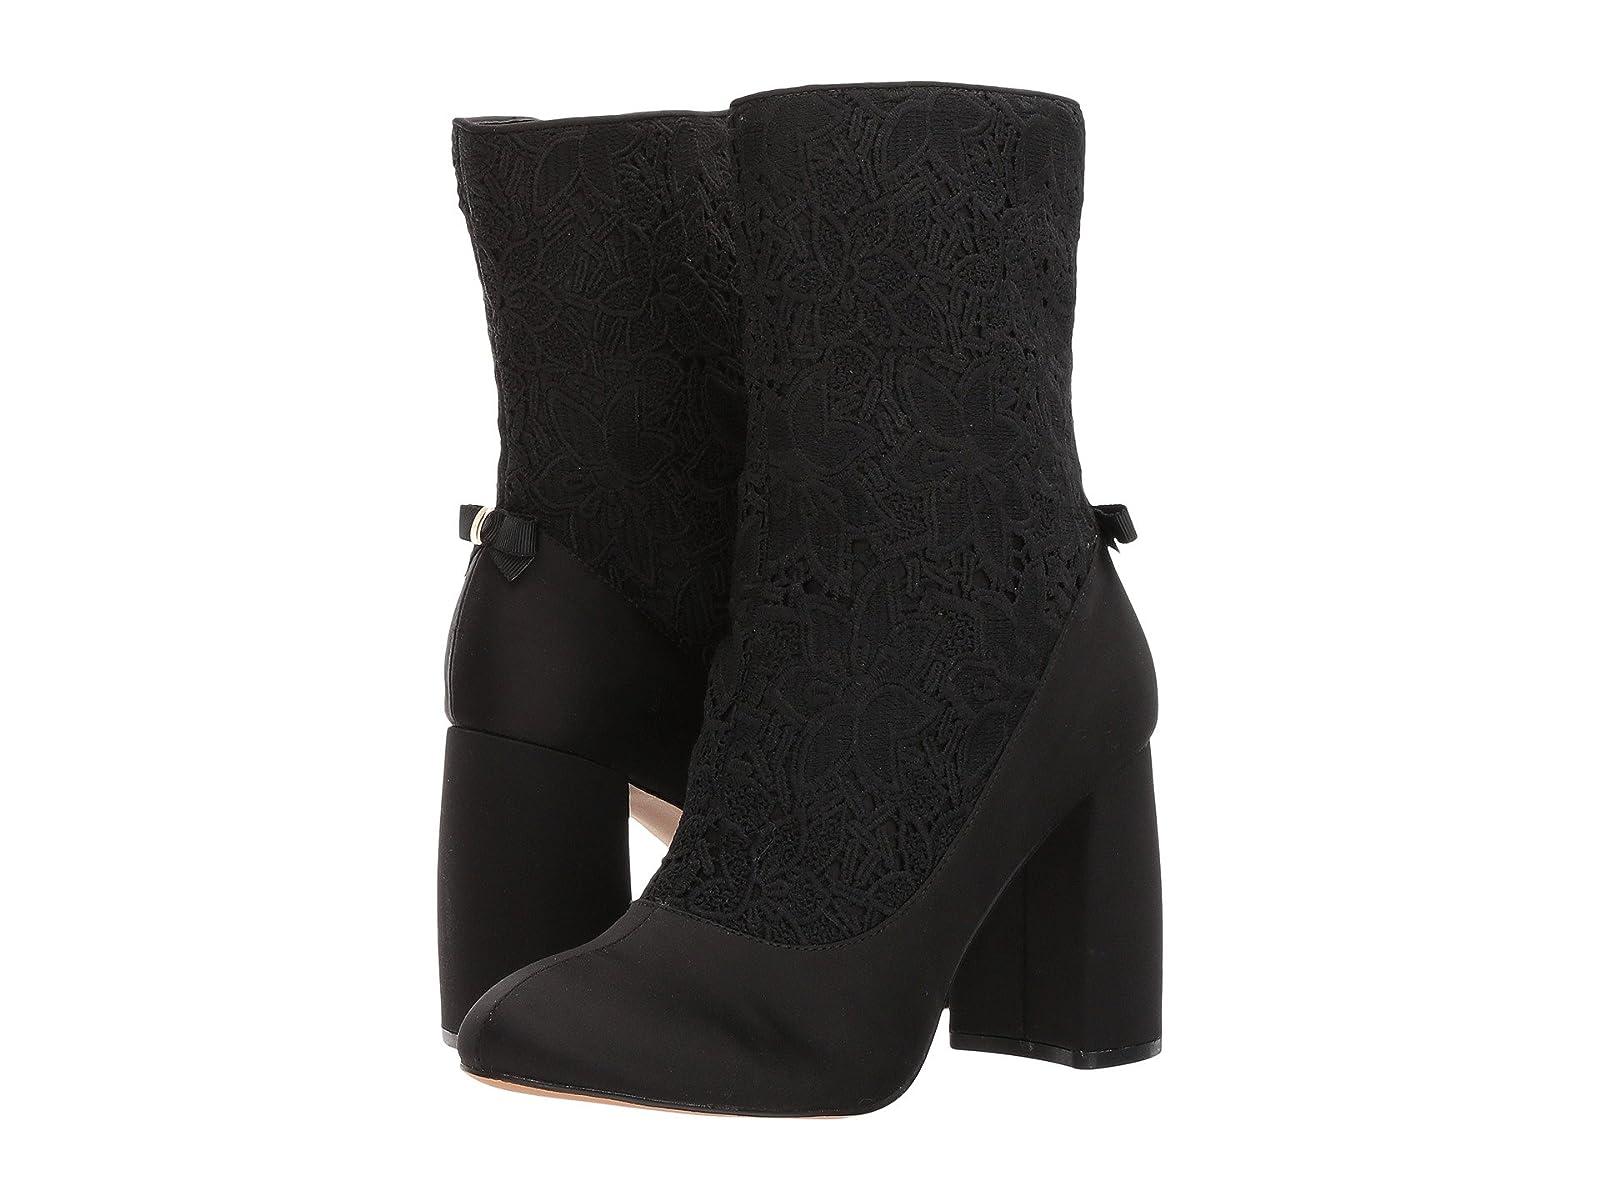 Nanette nanette lepore LinetteCheap and distinctive eye-catching shoes